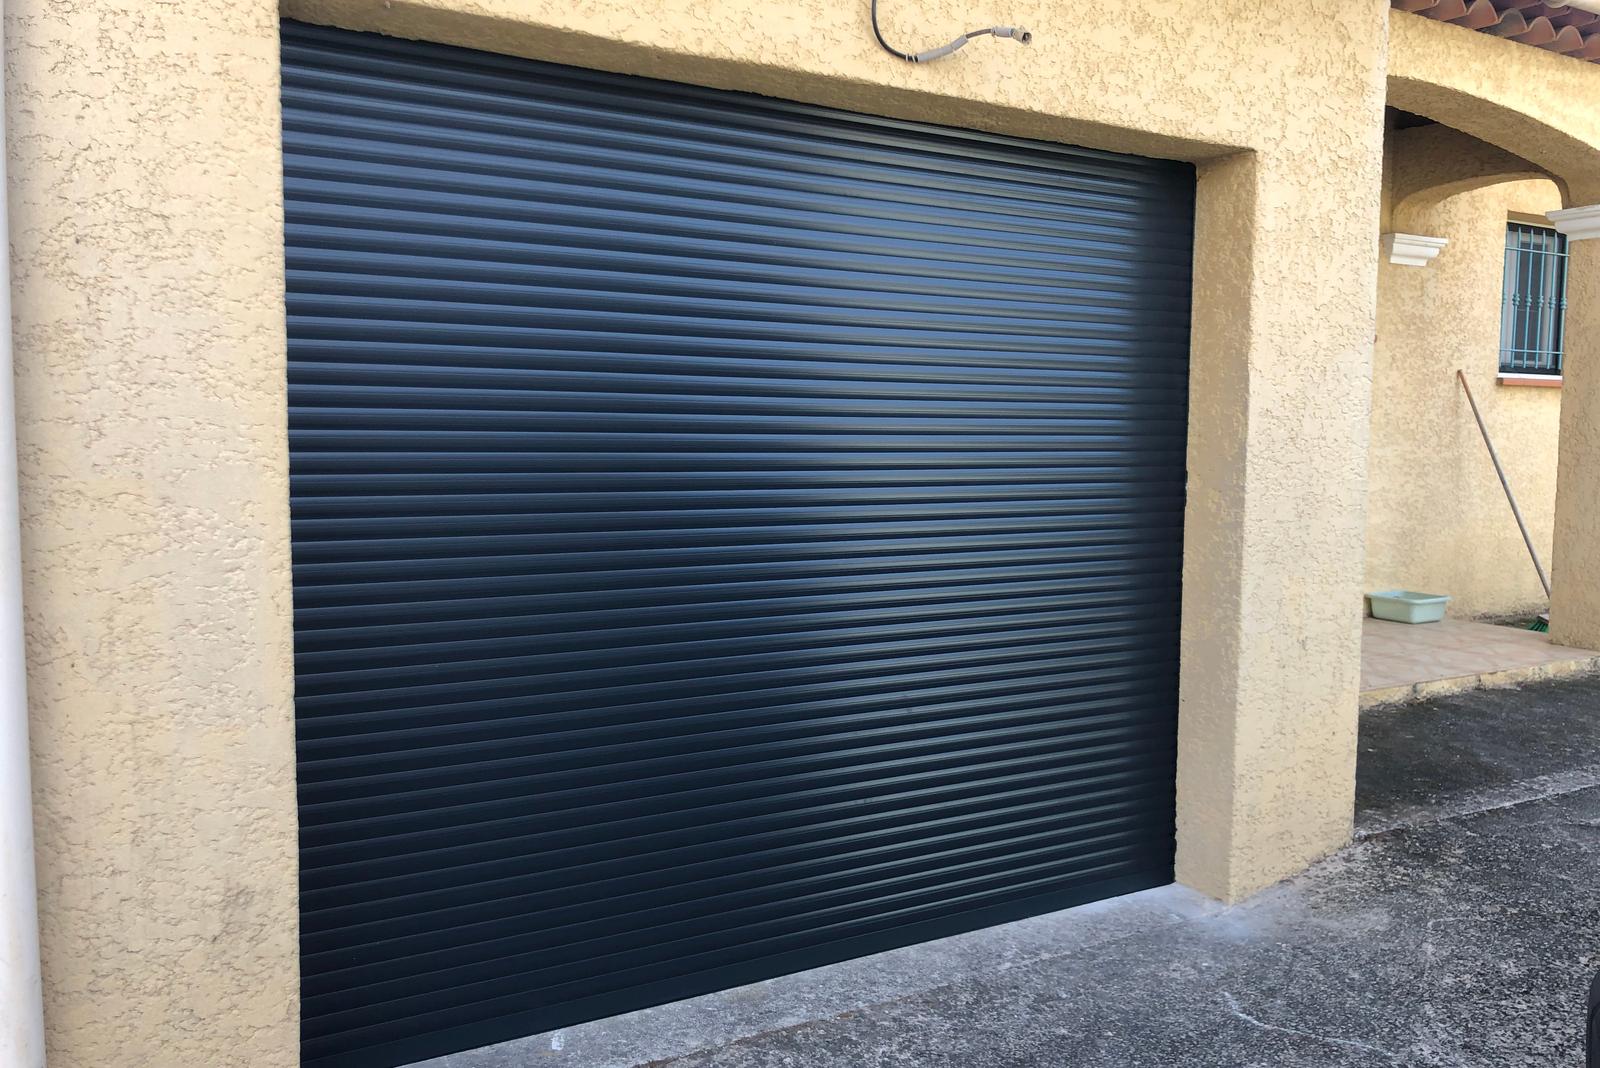 Pose / installation de porte enroulable dans le Var - Sud Alu